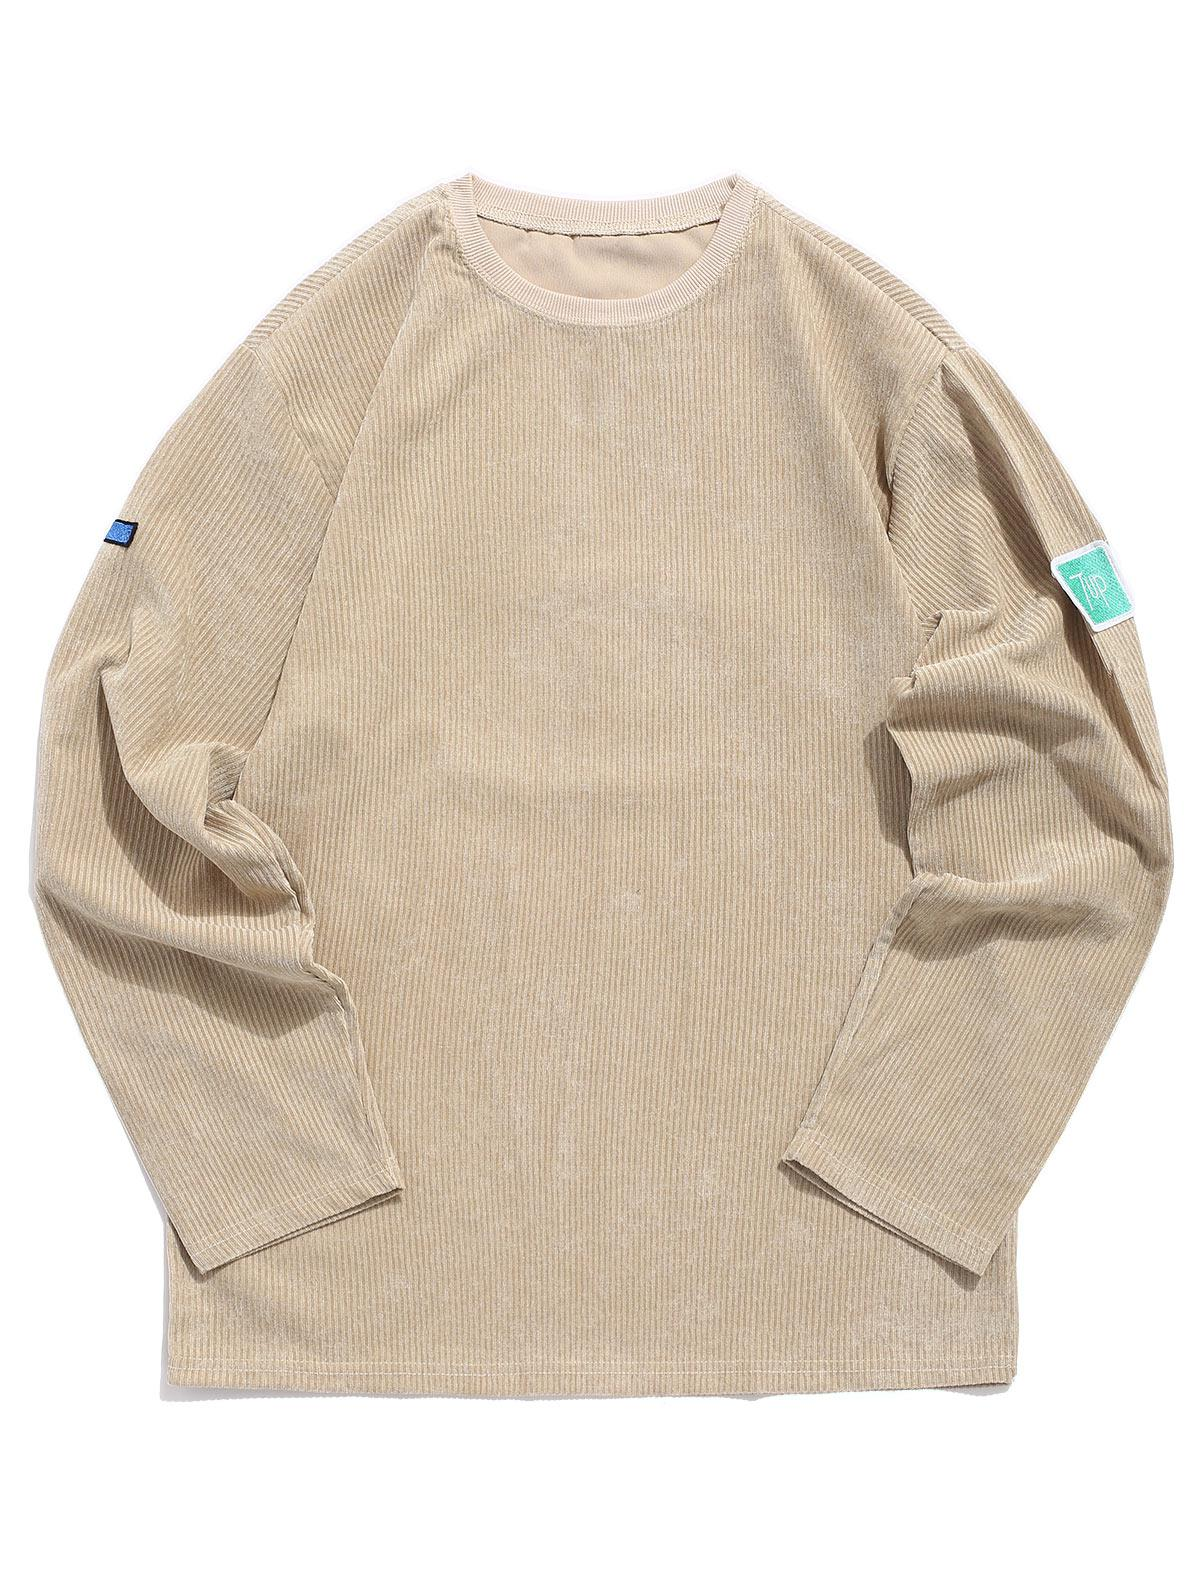 Embroidery Applique Pullover Casual Sweatshirt